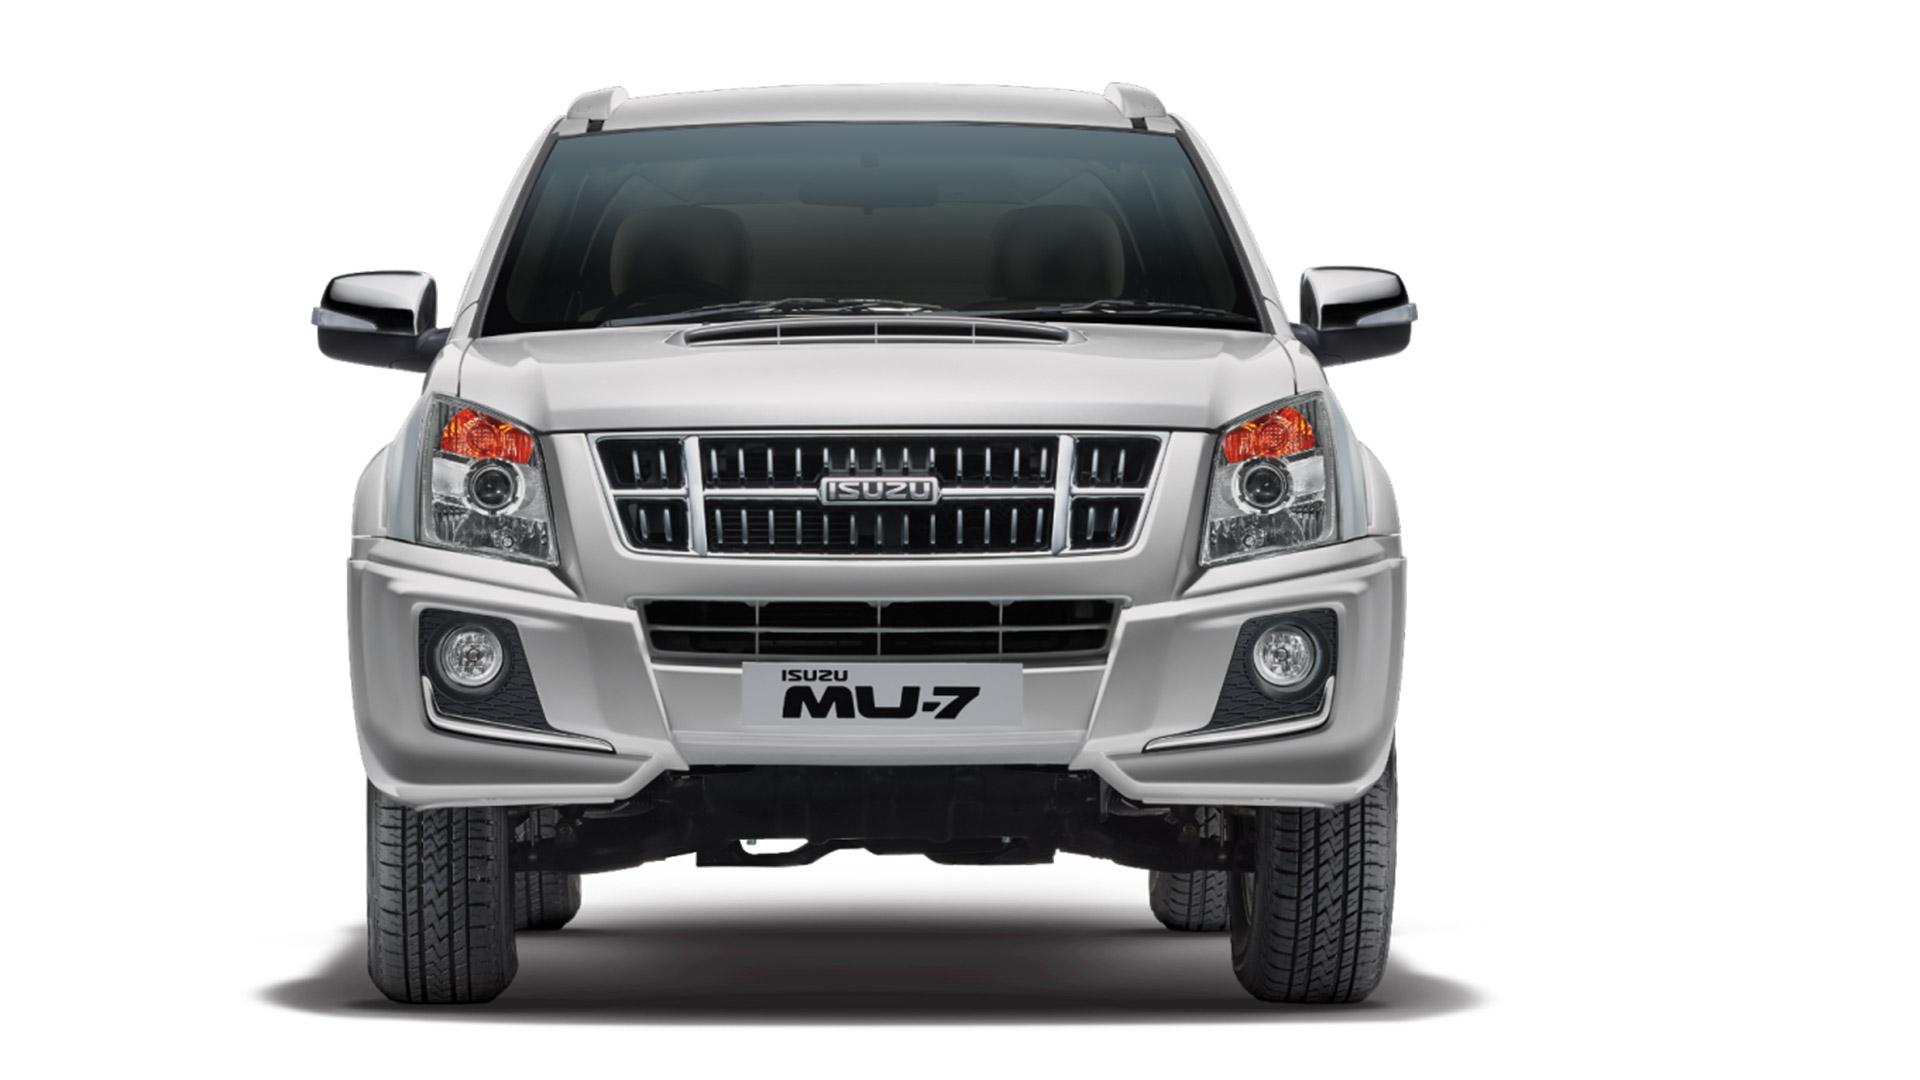 Isuzu mu7 2015 Premium AT Exterior